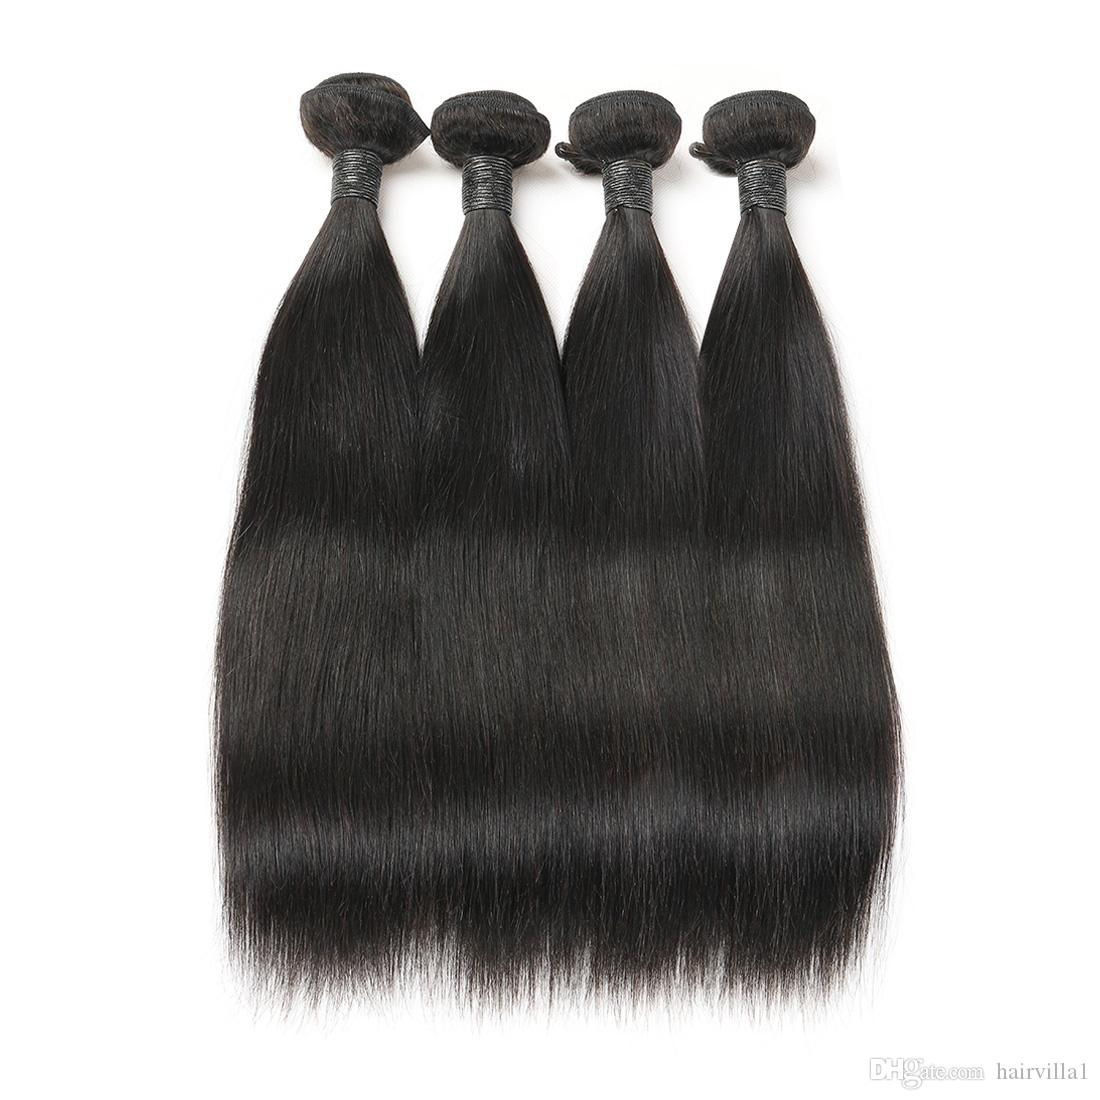 9a Indian Virgin Hair Straight 4 Bundles 100 Unprocessed Human Hair